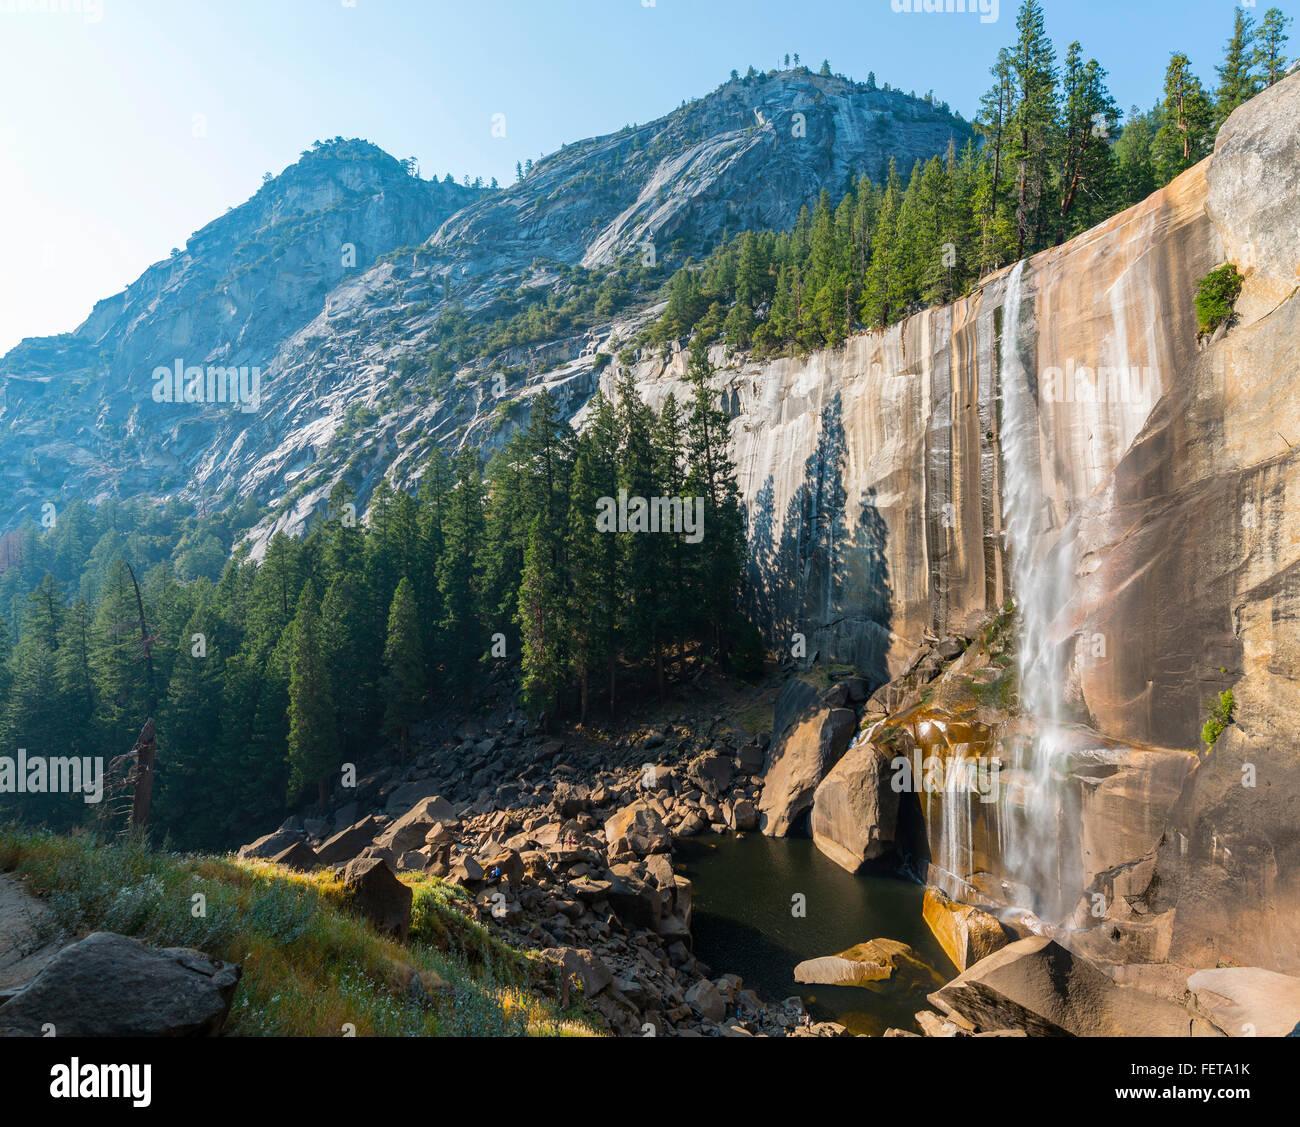 Automne Vernal, vallée de Yosemite, Yosemite National Park, UNESCO World Heritage Site, California, USA Photo Stock